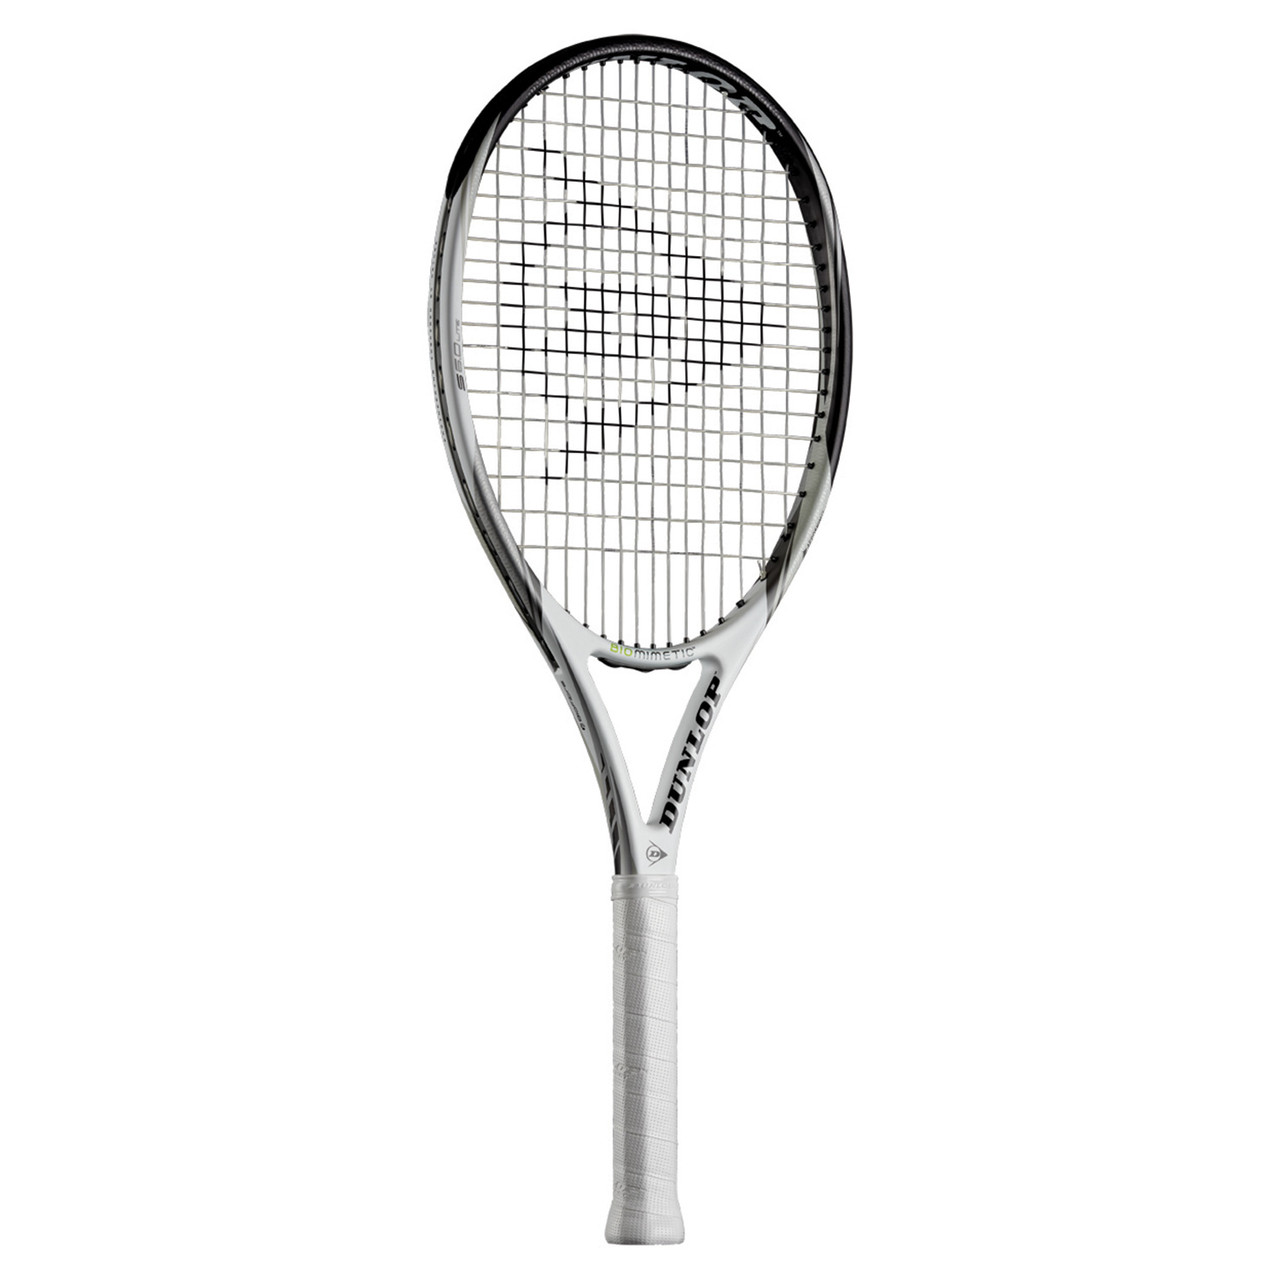 Теннисная ракетка Dunlop D Tr Biomimetic S6.0 Lite G4 Hl 676290-NC